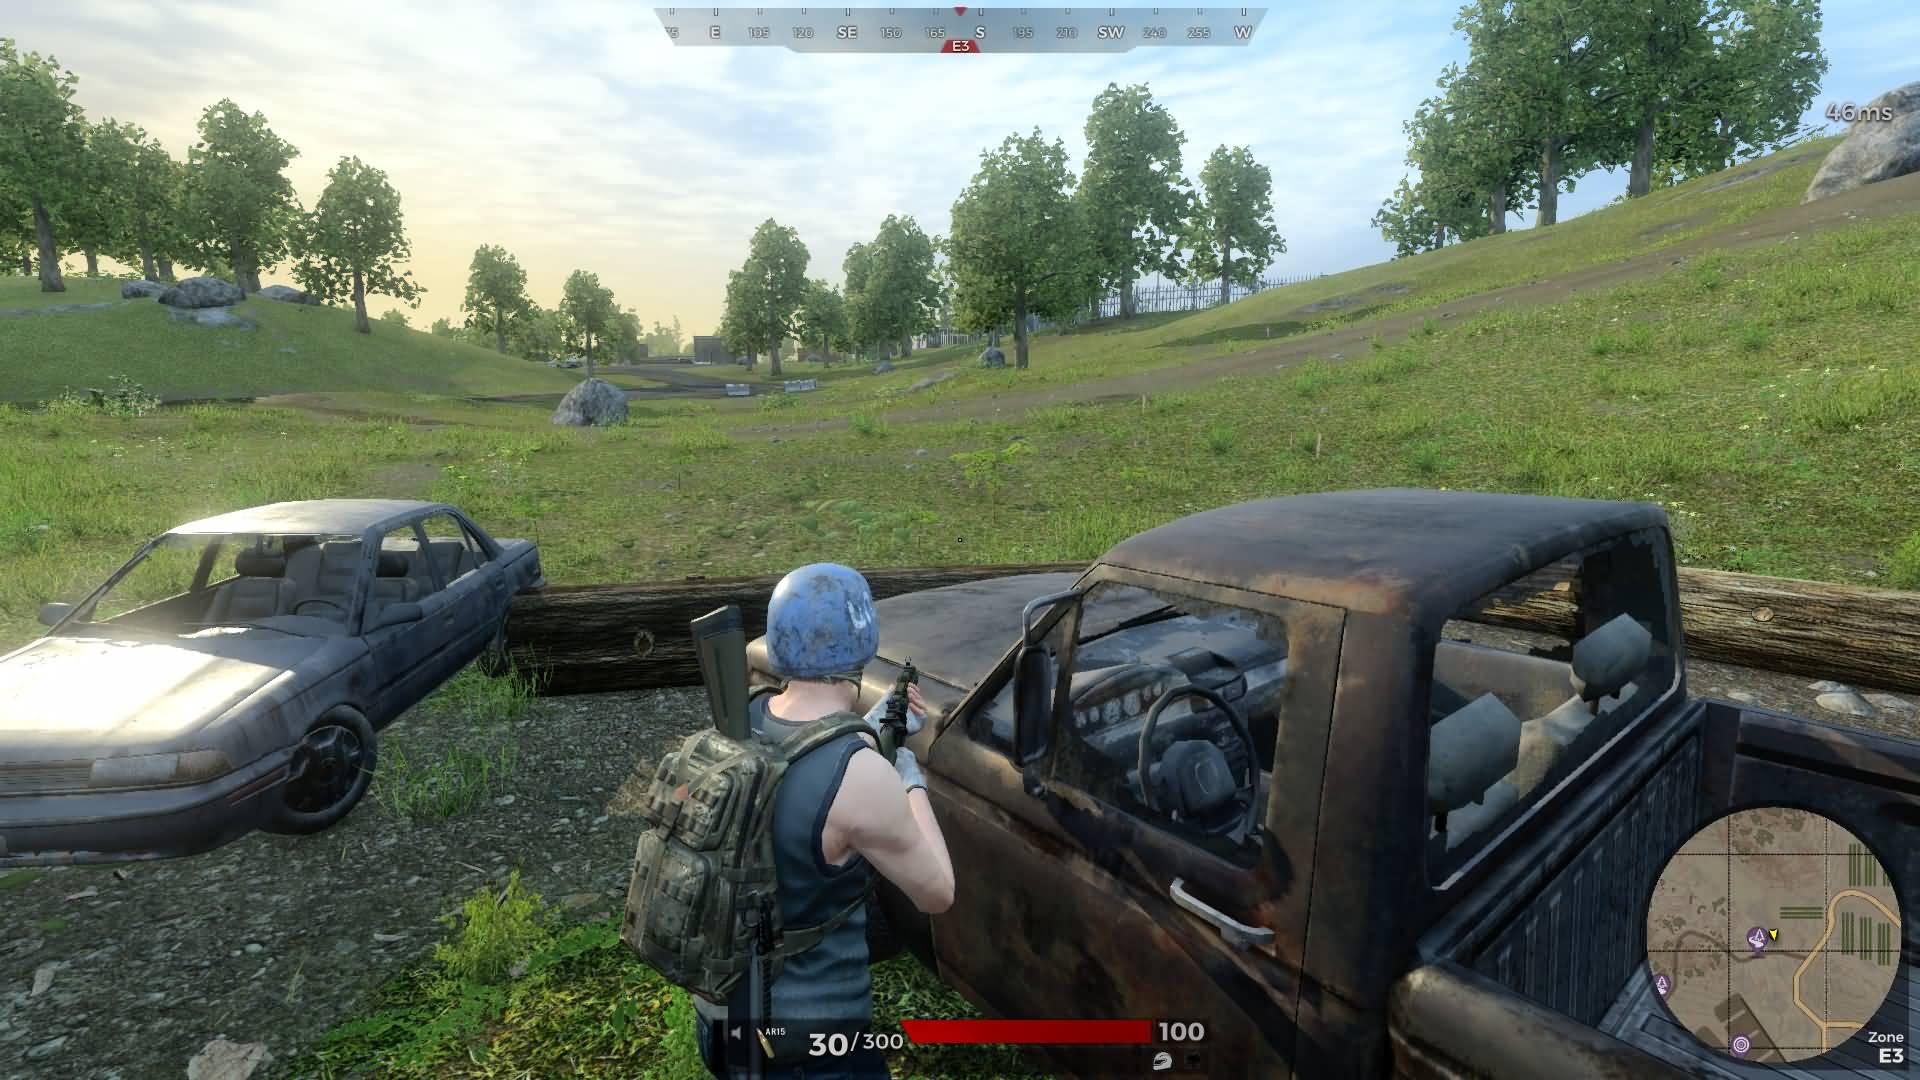 H1Z1: Battle Royale Download